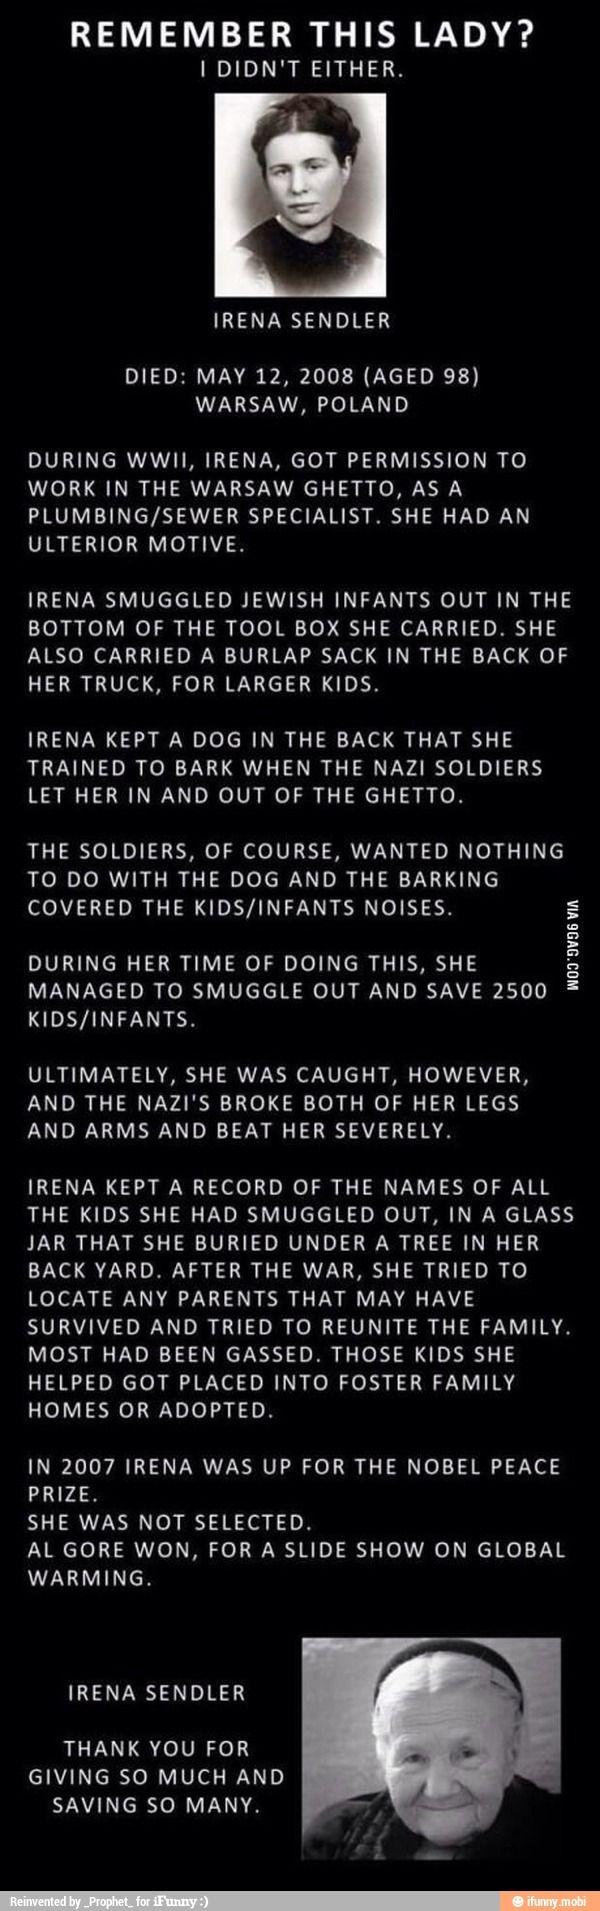 #World war 2 heros